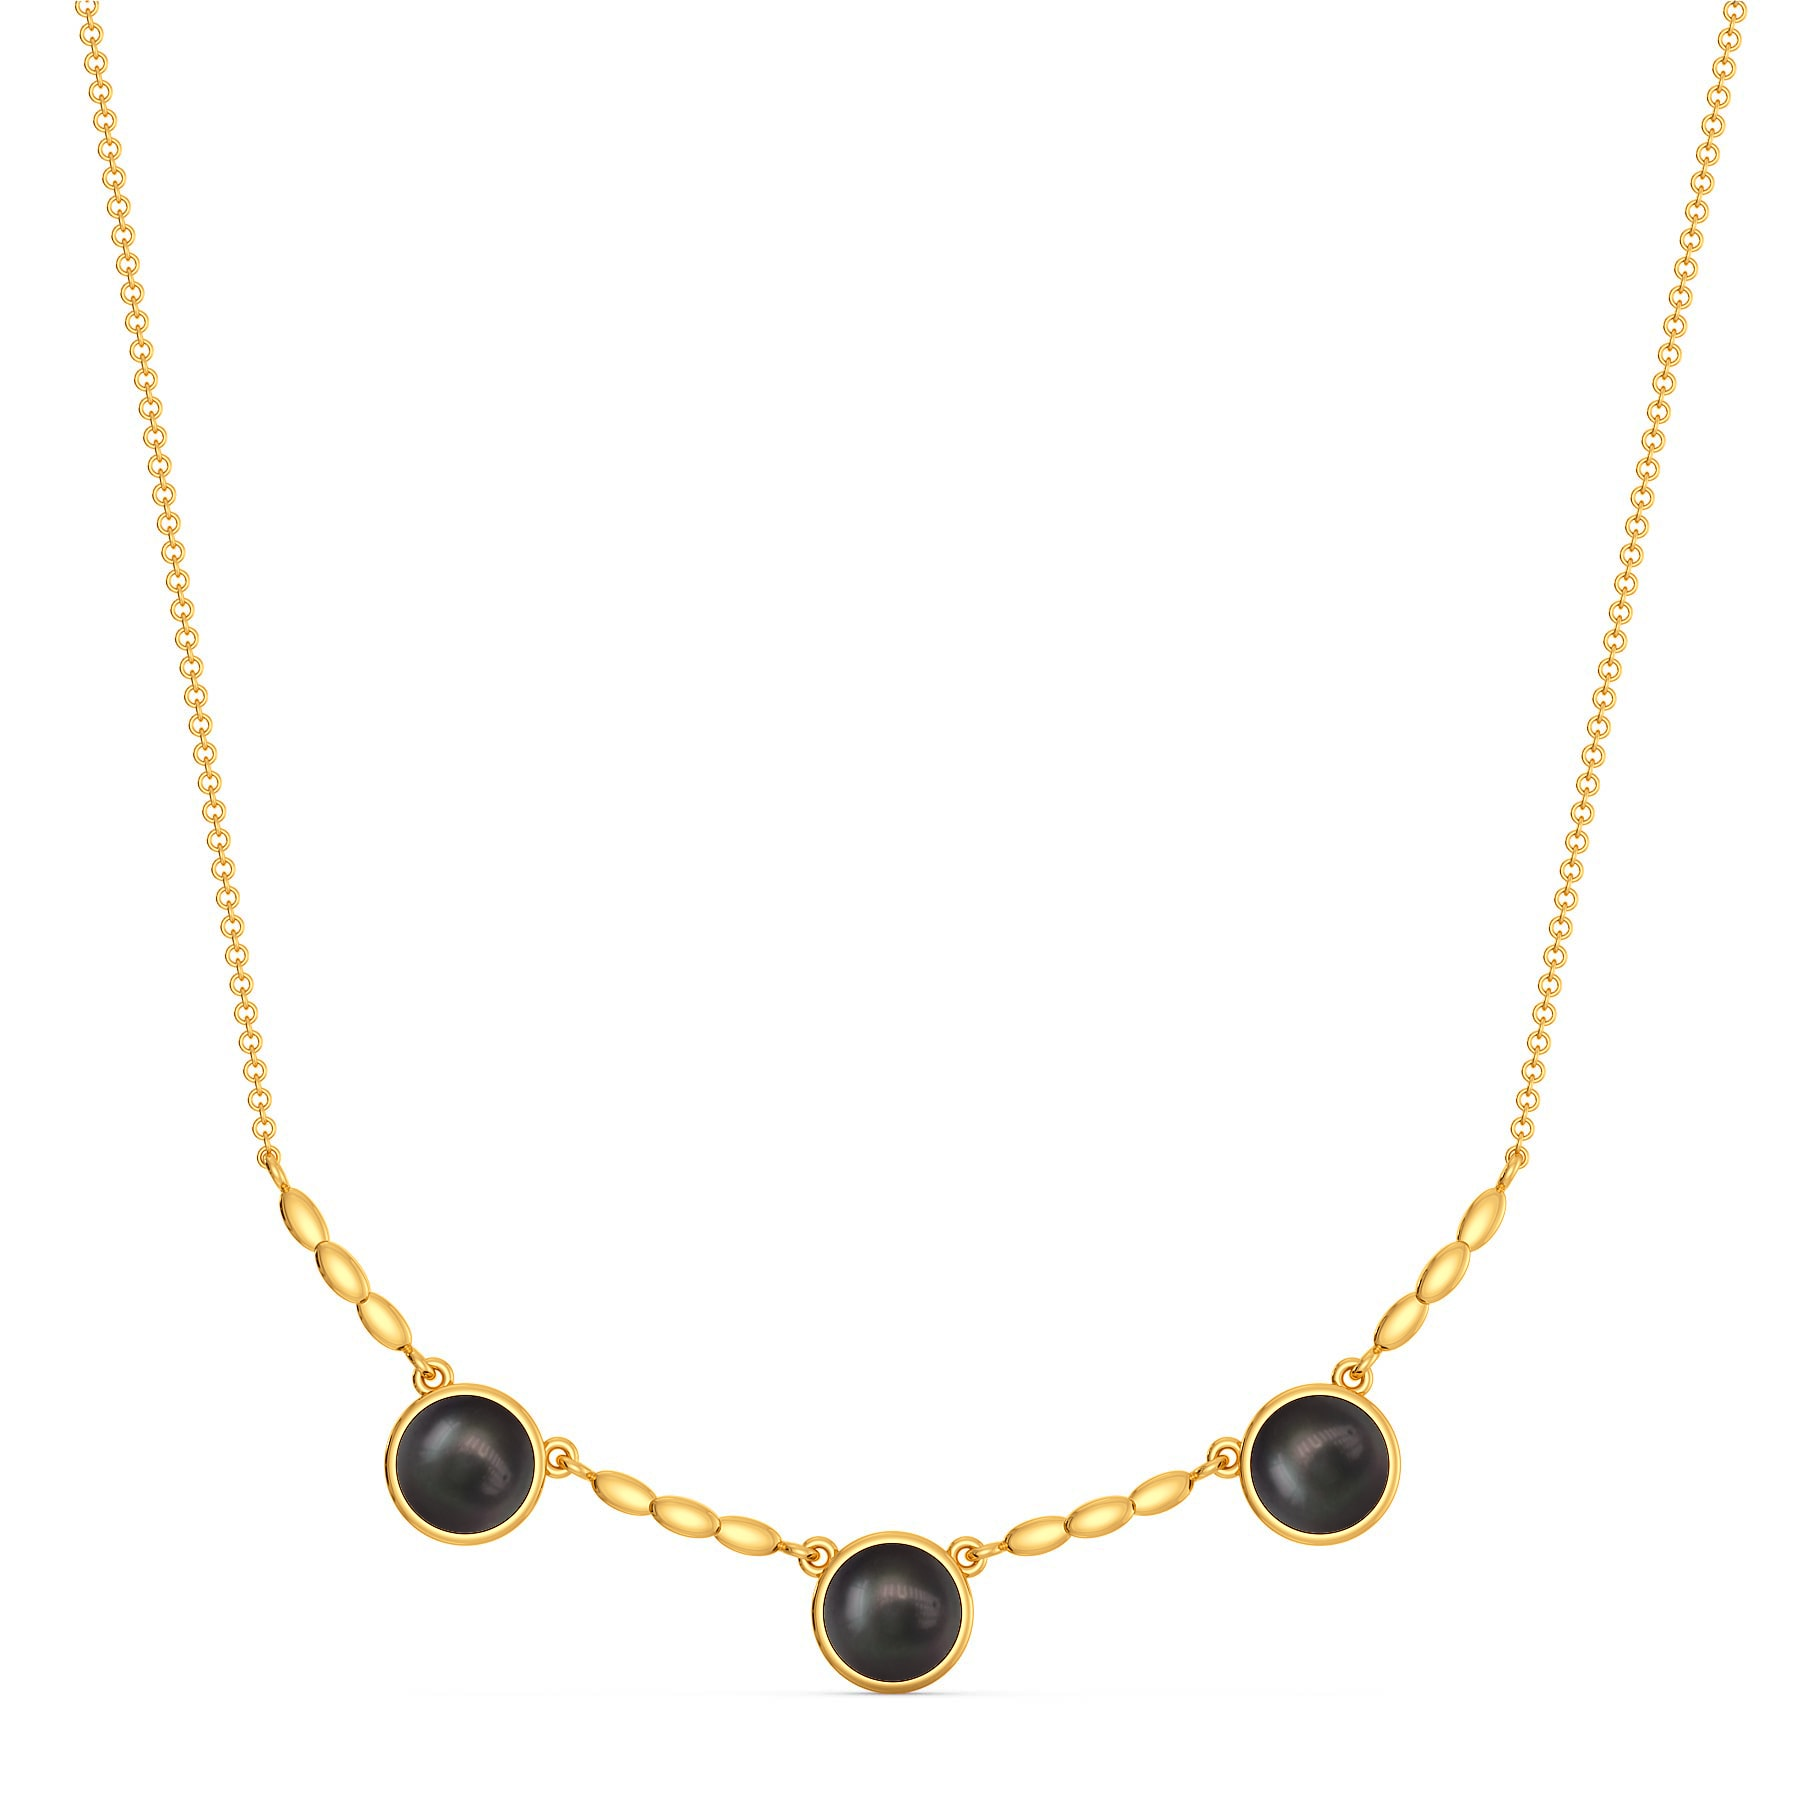 All Over Black Gemstone Necklaces